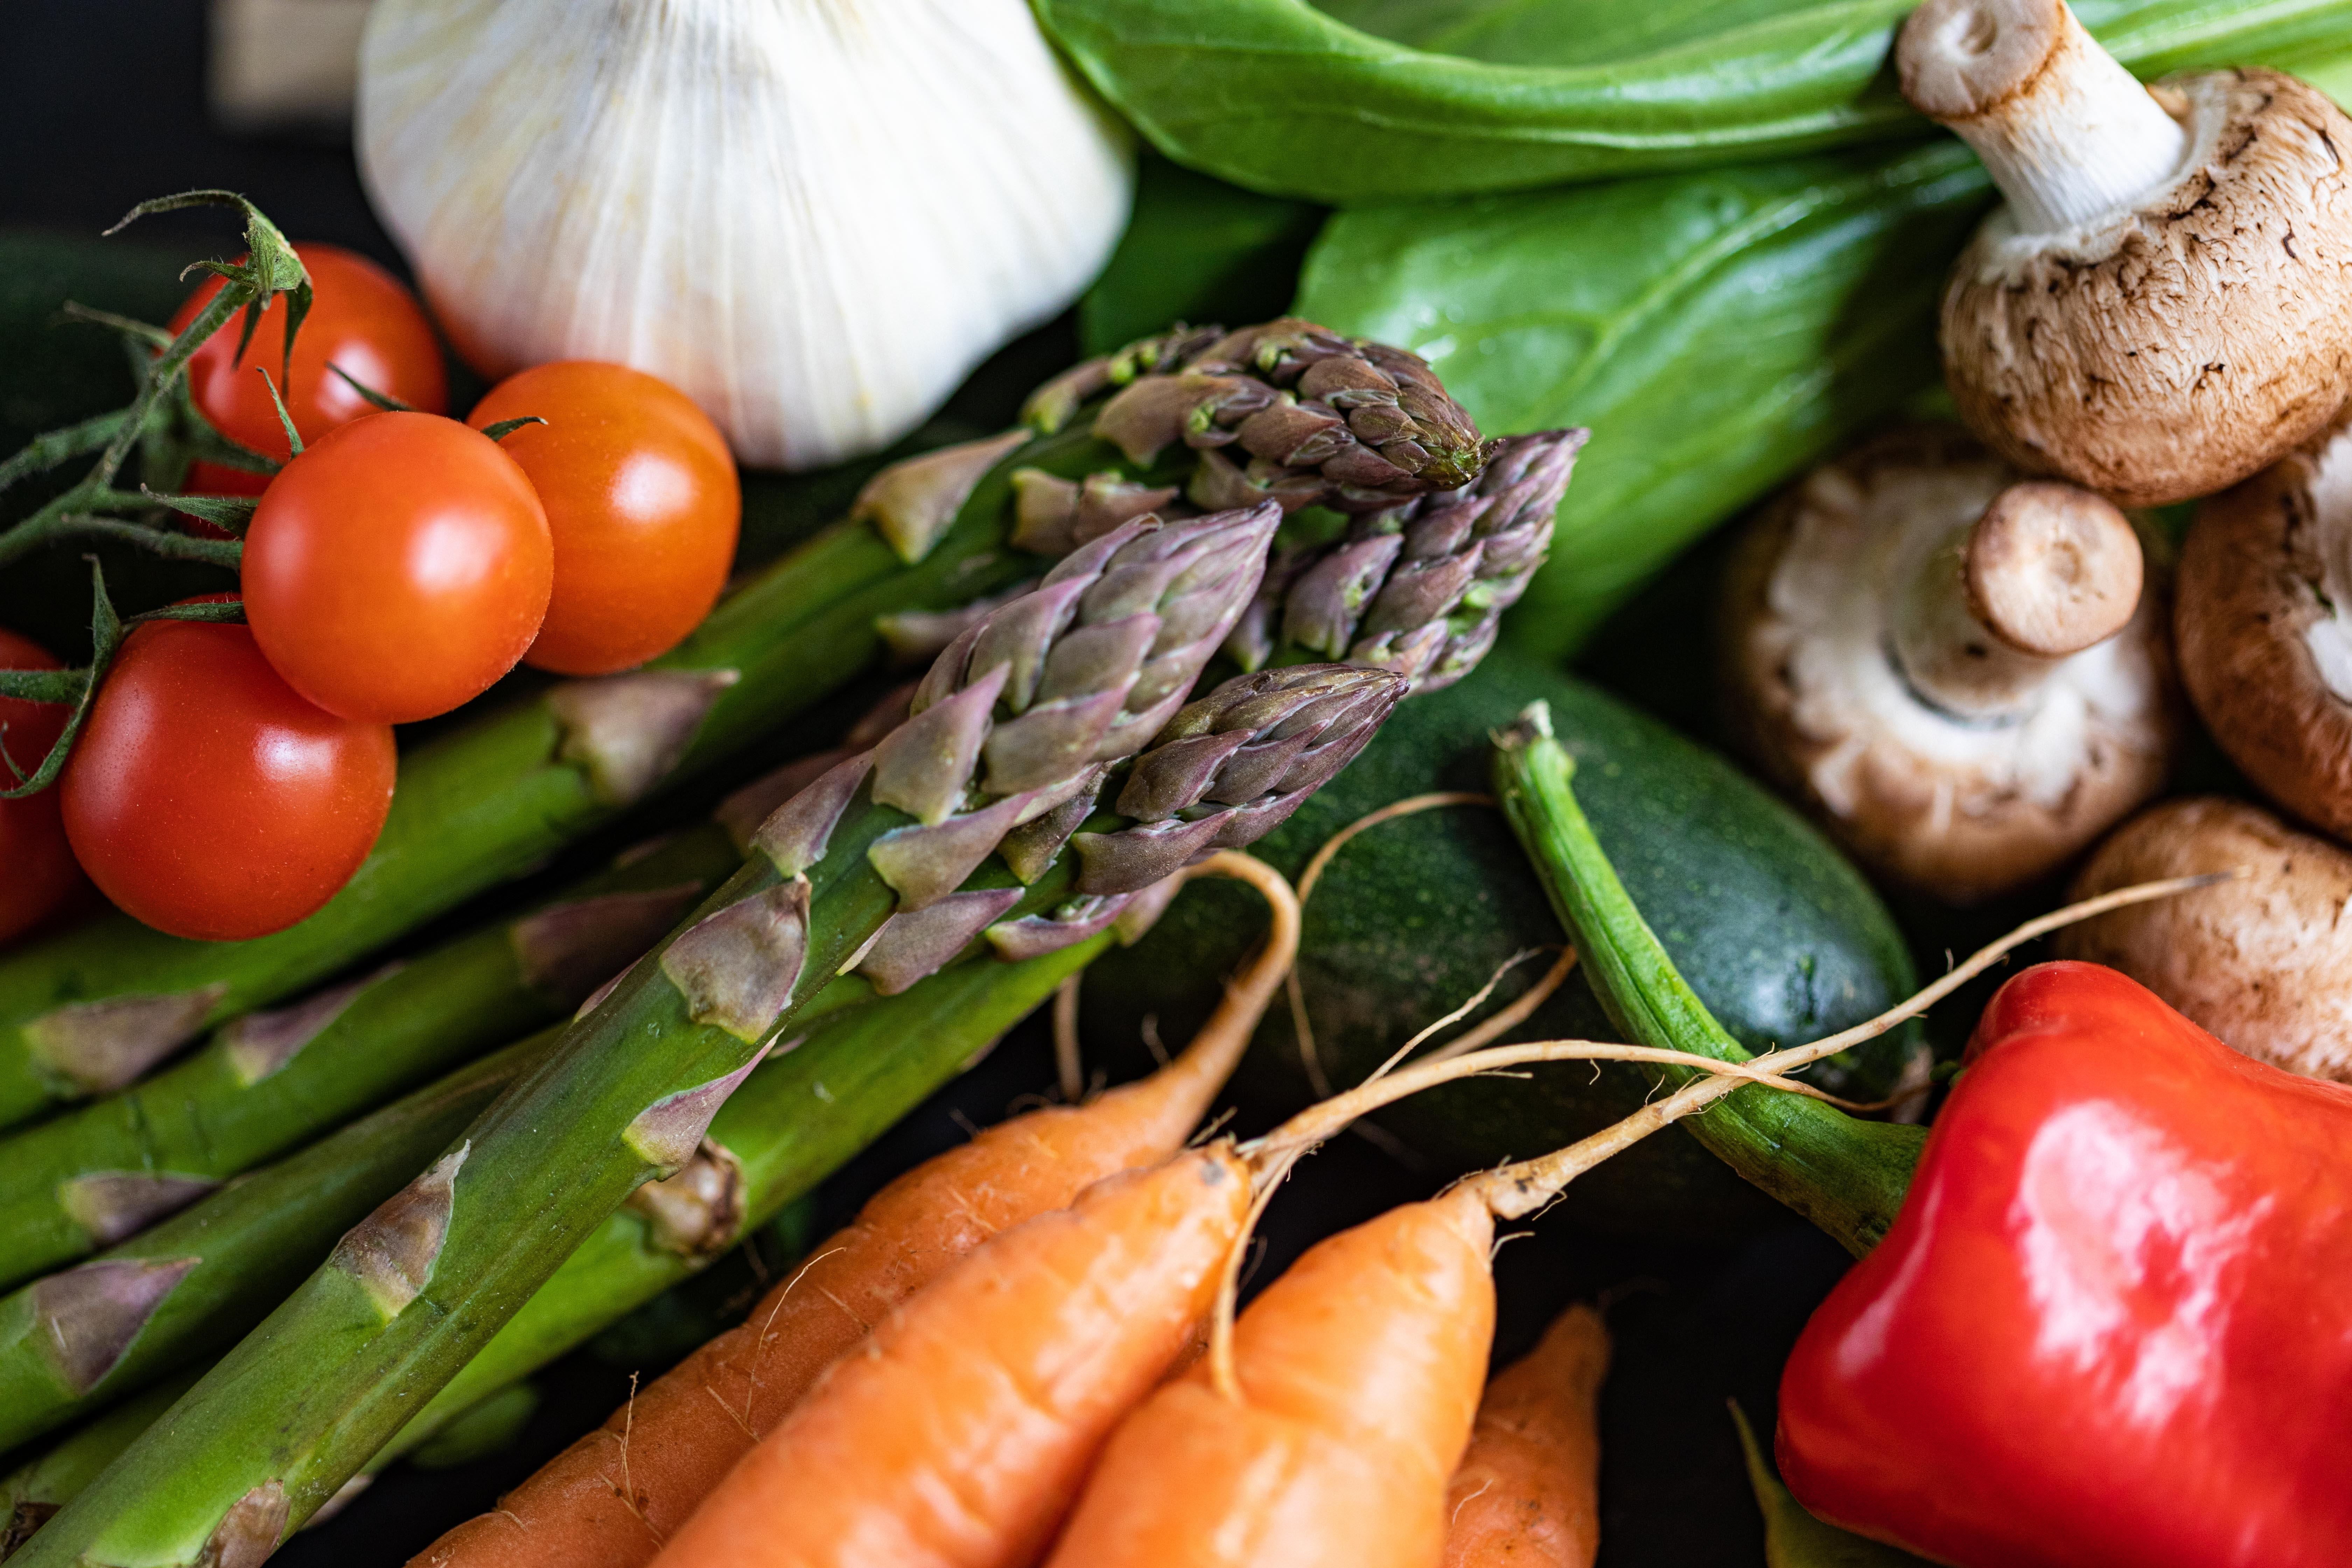 Fruit, veg & salad